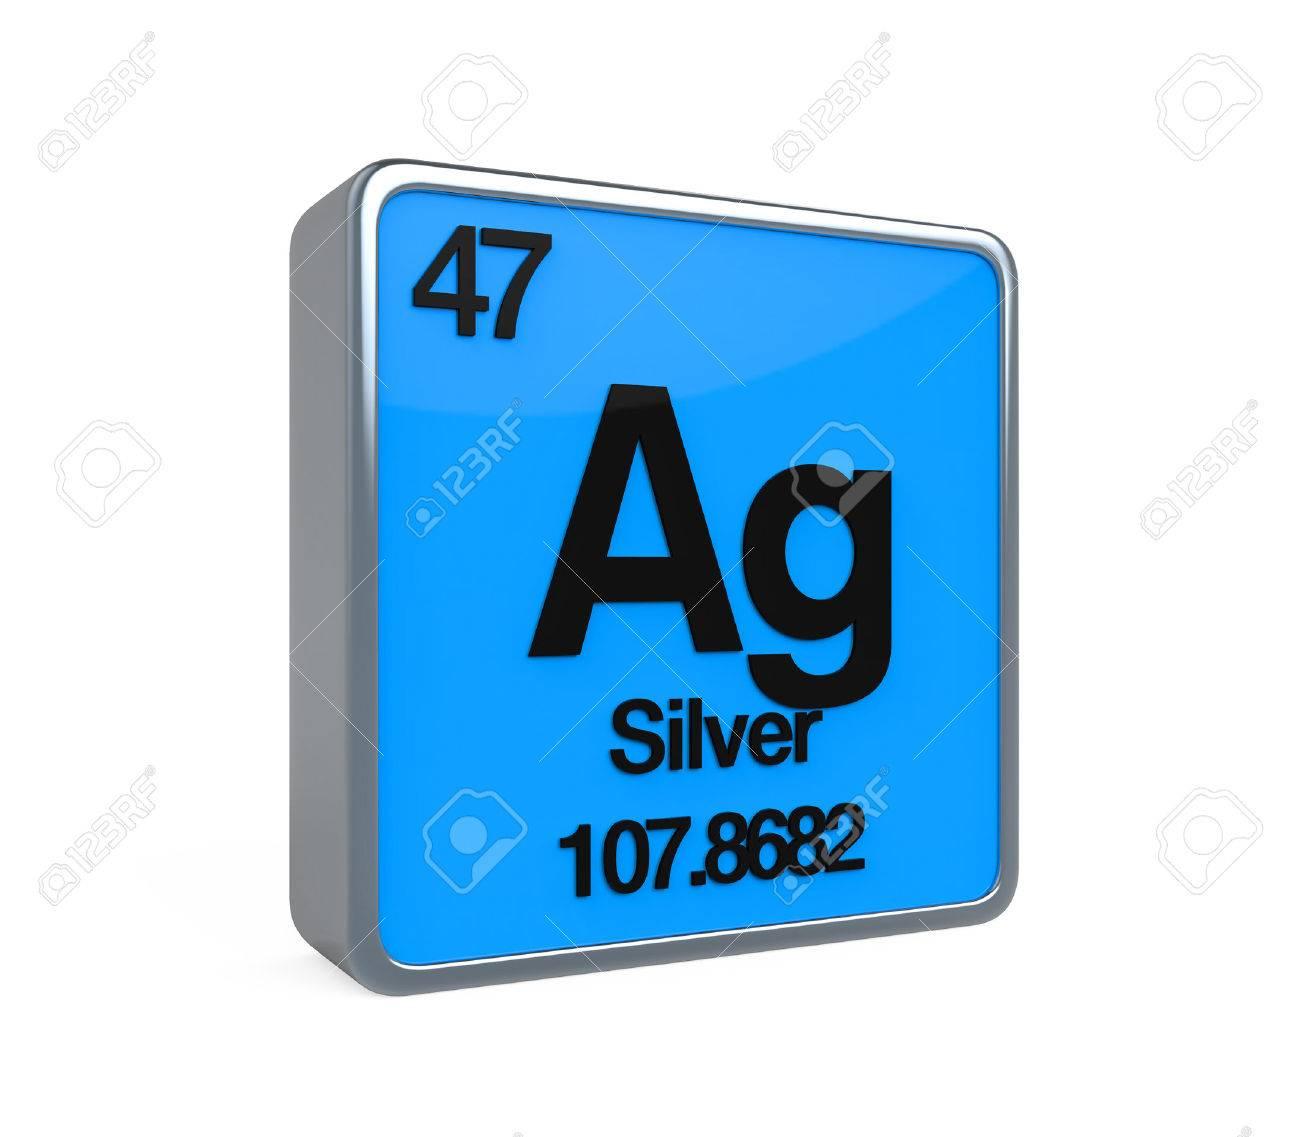 Silver element periodic table stock photo picture and royalty silver element periodic table stock photo 32867860 buycottarizona